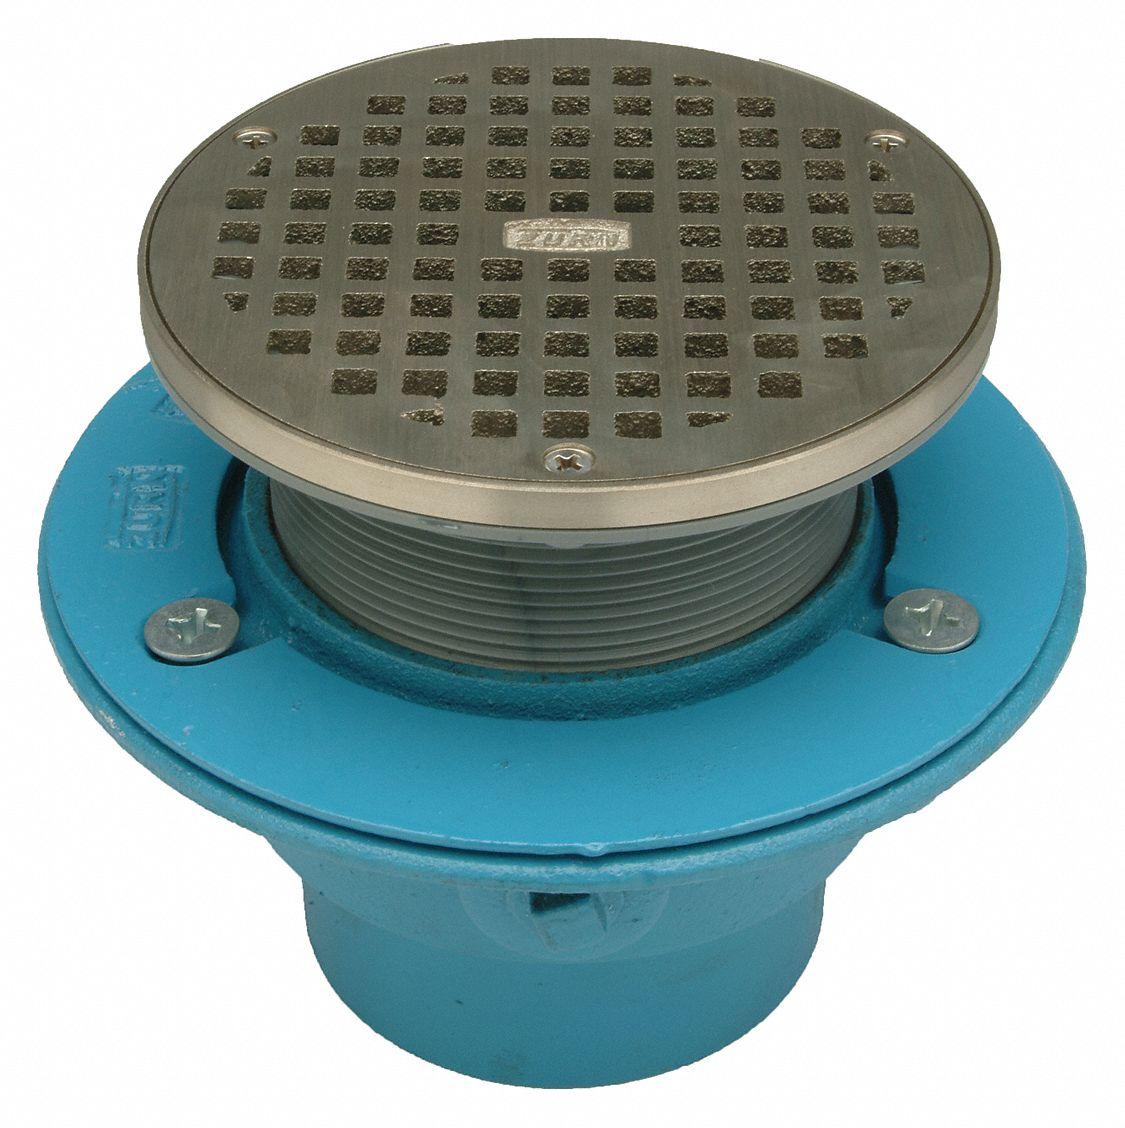 zurn itm with iron floors drain grate ebay cast s floor